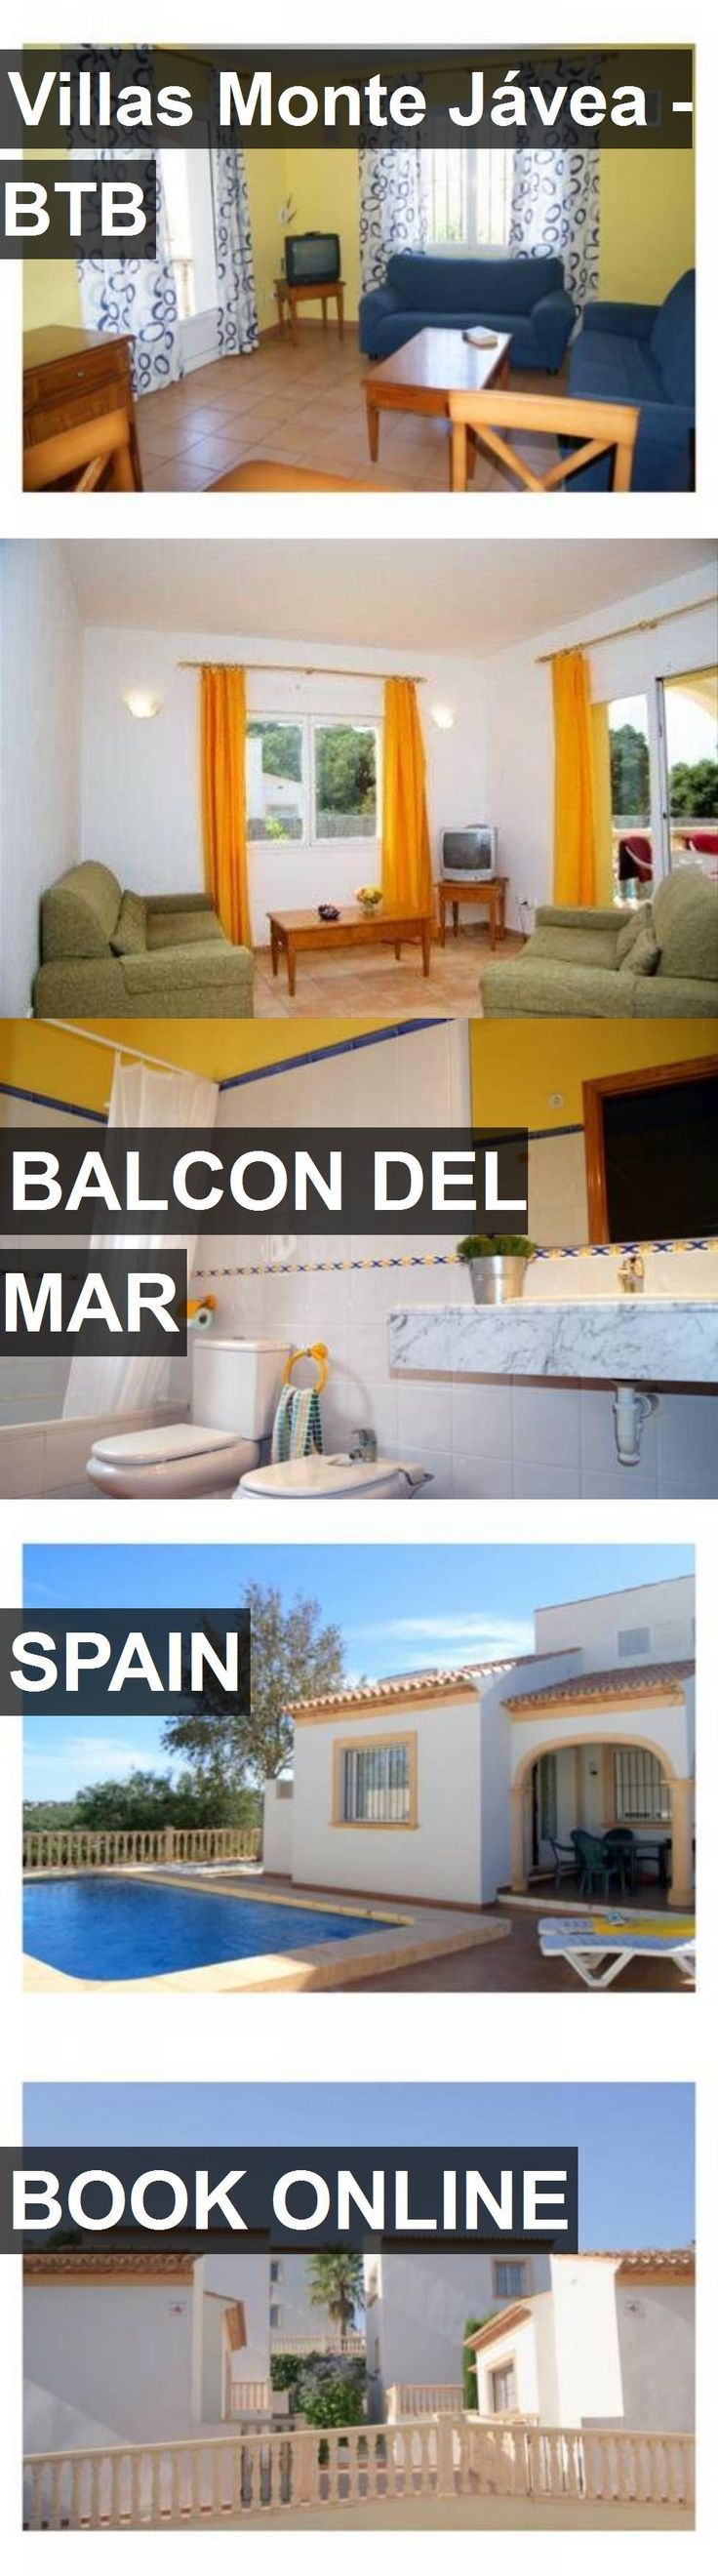 Hotel Villas Monte Jávea - BTB in Balcon del Mar, Spain. For more information, photos, reviews and best prices please follow the link. #Spain #BalcondelMar #hotel #travel #vacation